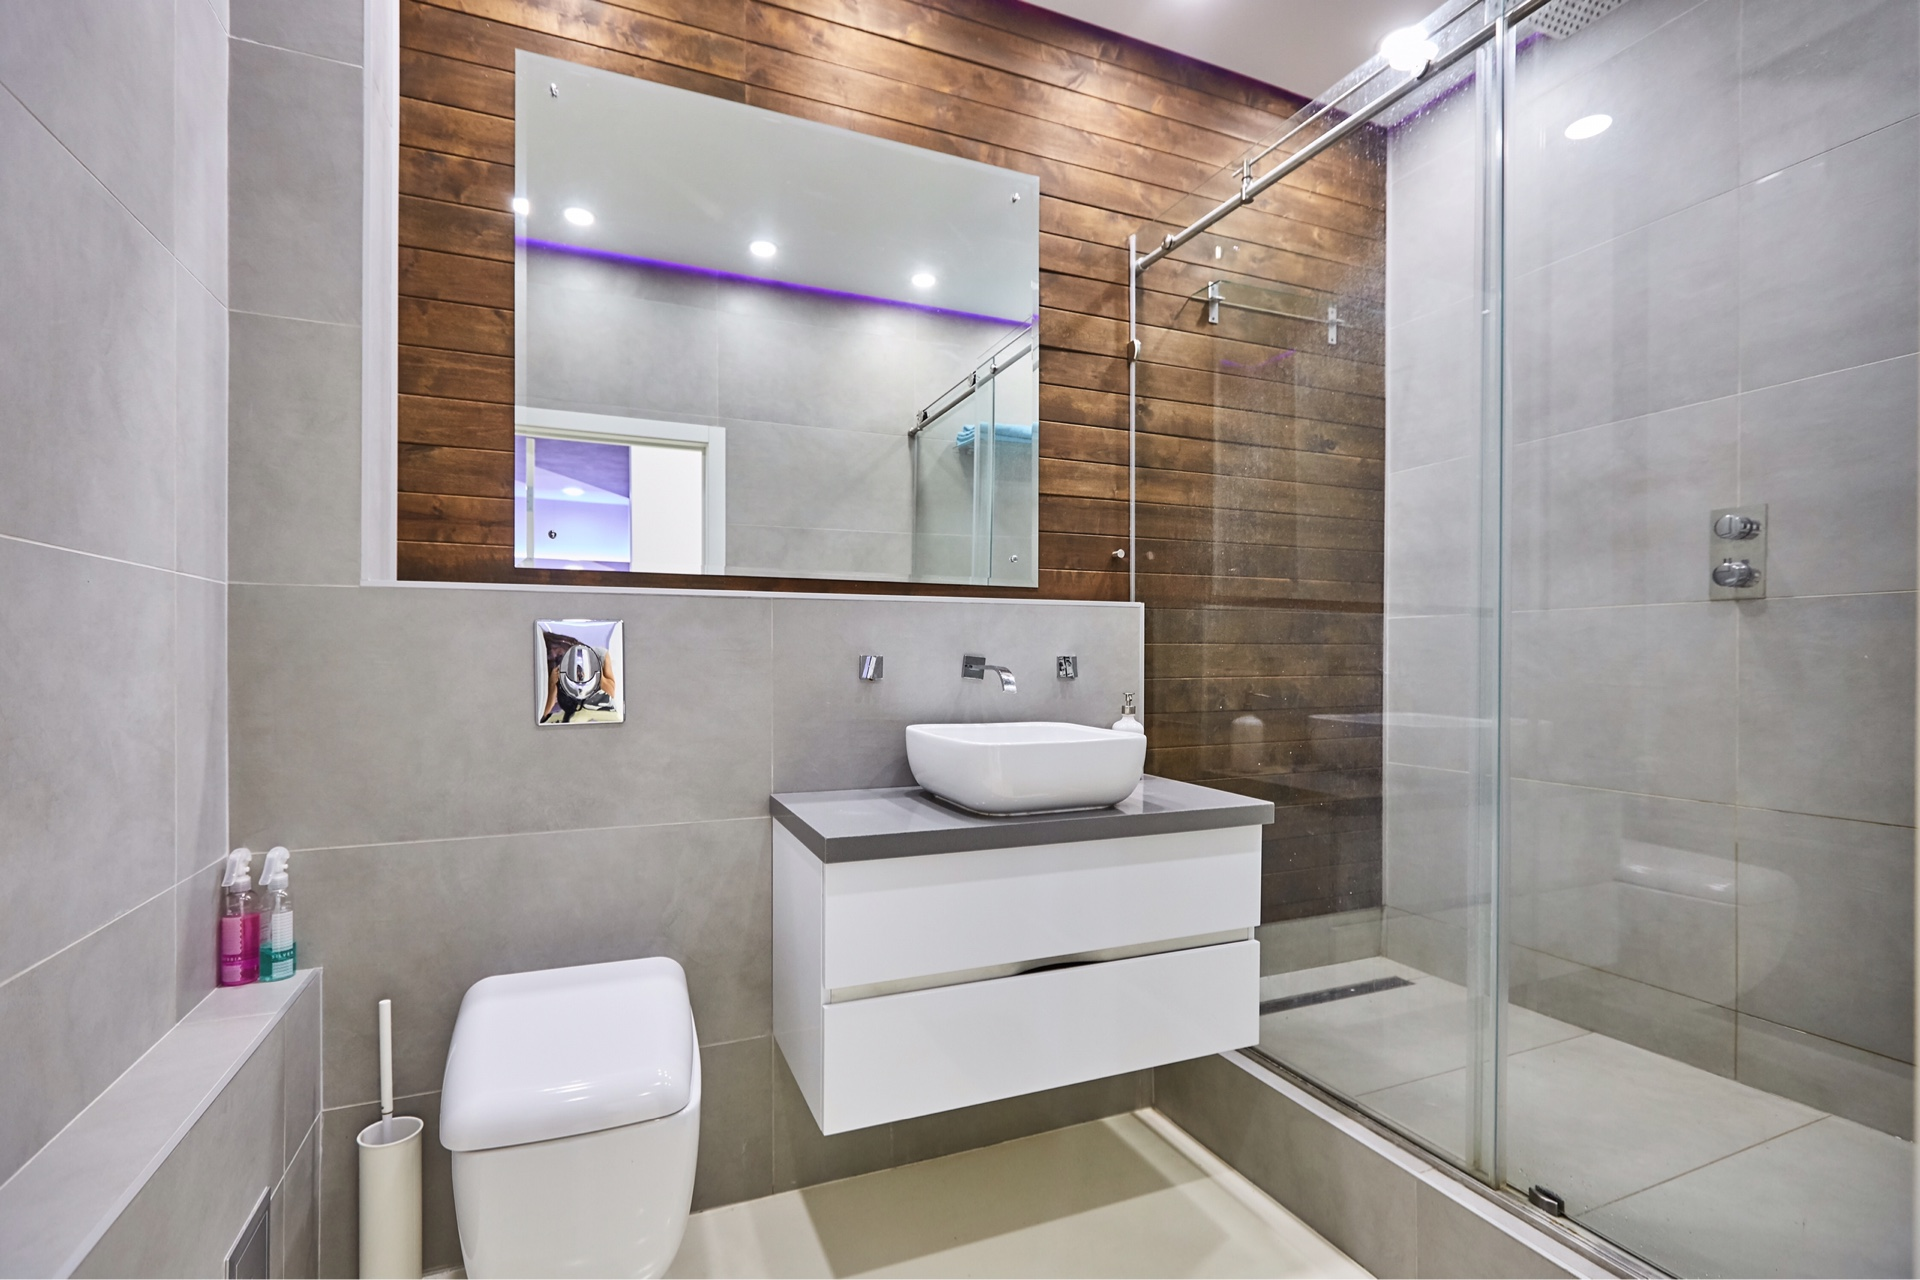 yarkij dizajn vannoj komnaty s dushem v temnyh tonah - Идеи и советы для ремонта в ванной комнате